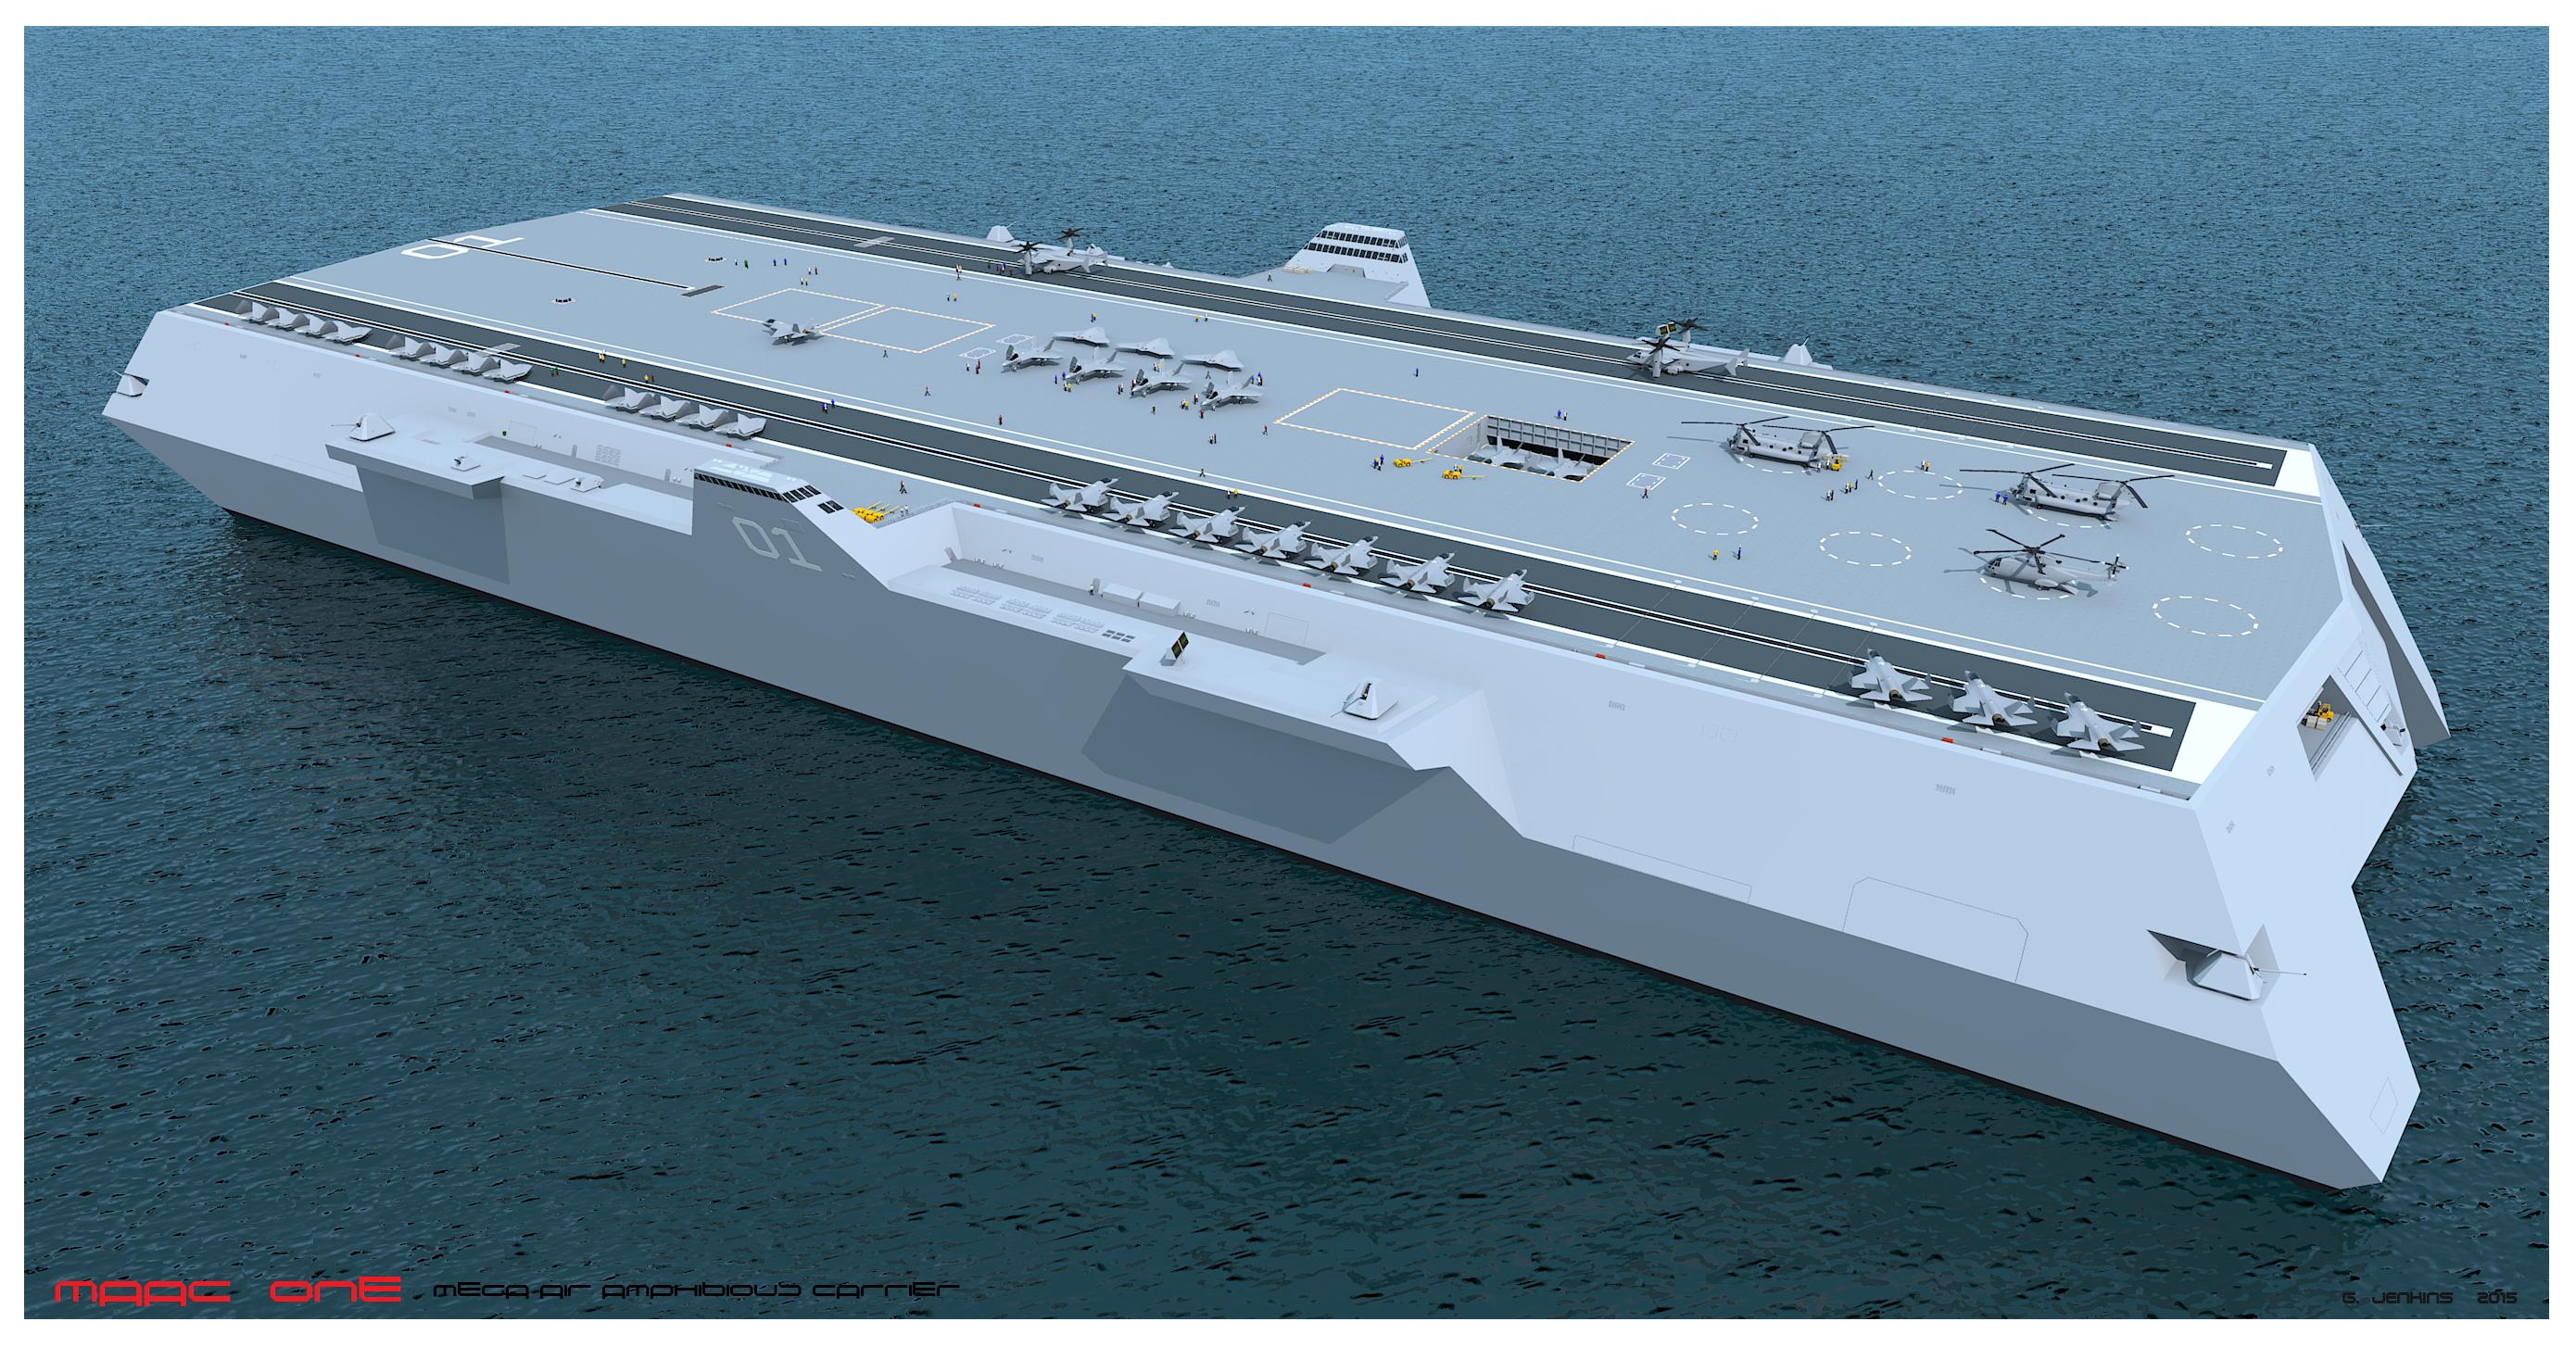 Maac One Multihull Air Amphibious Carrier By G Jenkins Catamaran Designs Pinterest